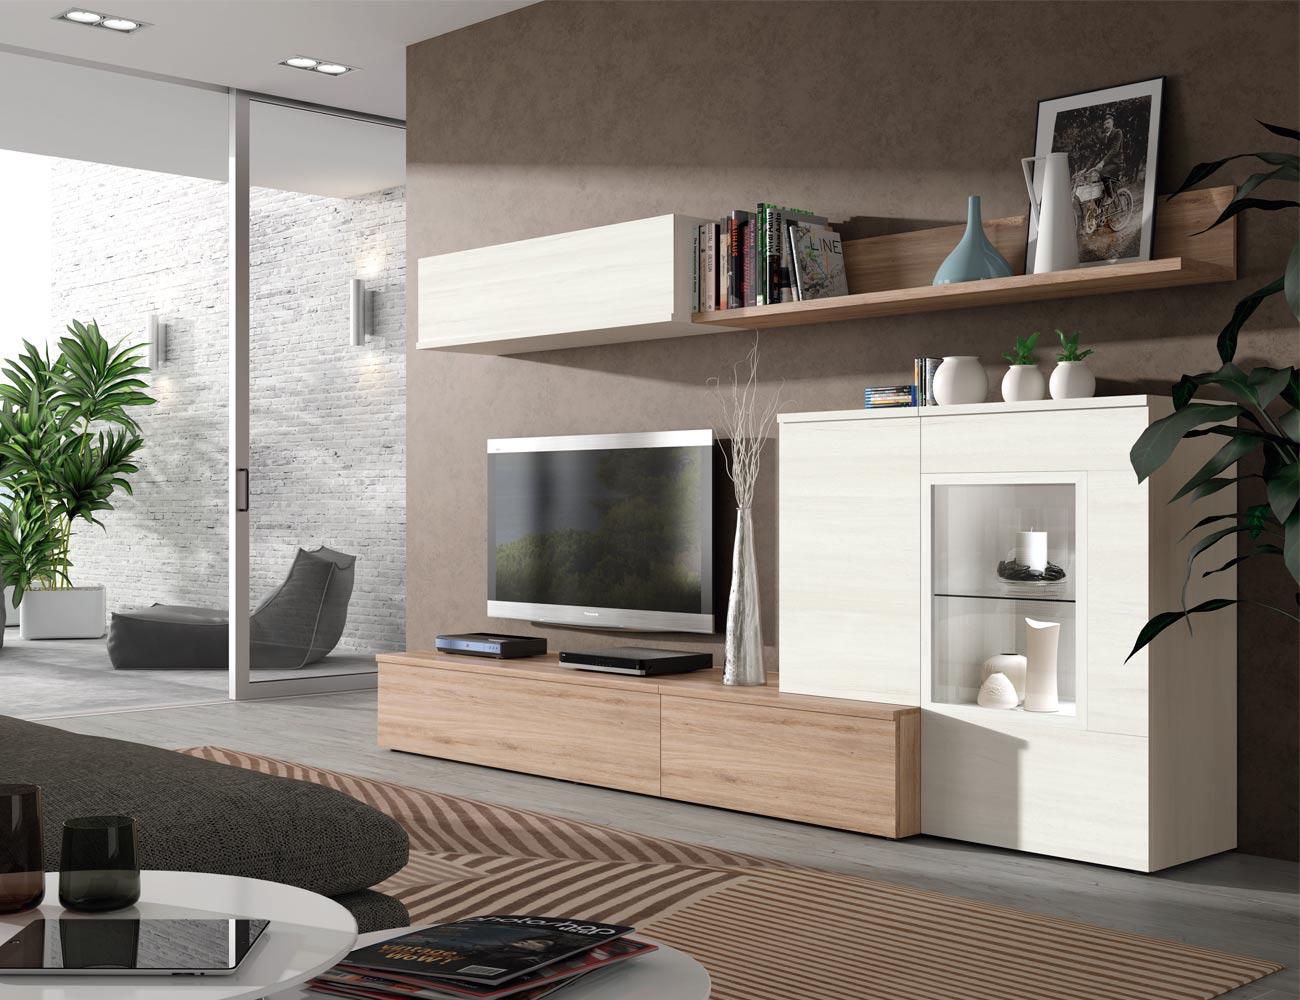 605 mueble salon comedor roble natural polar focos leds